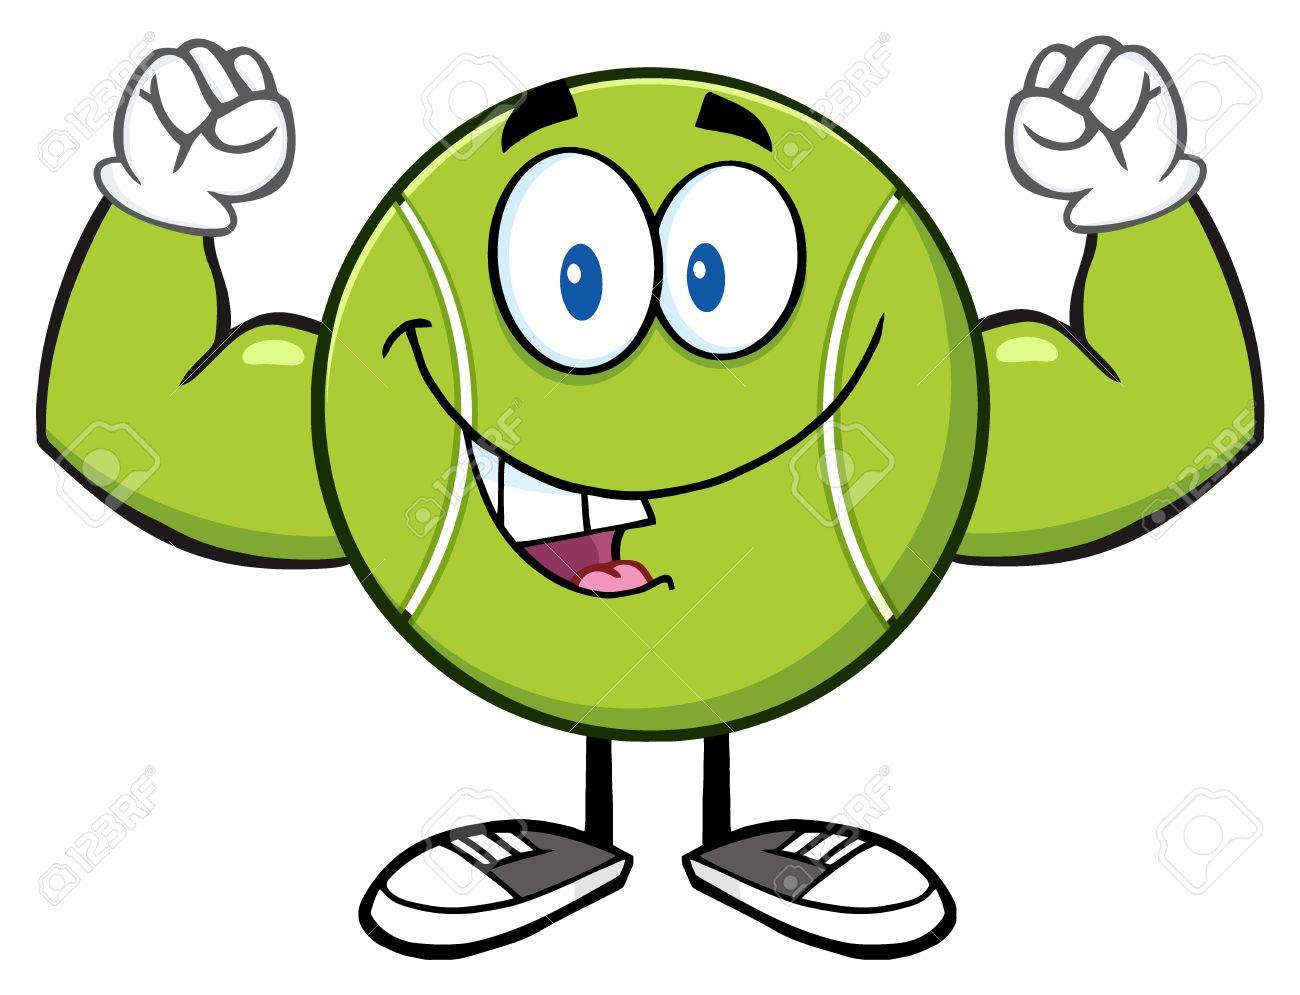 Tennis ball mascot stock photos tennis ball mascot stock photography - Happy Tennis Ball Cartoon Mascot Character Flexing Stock Photo 57271071